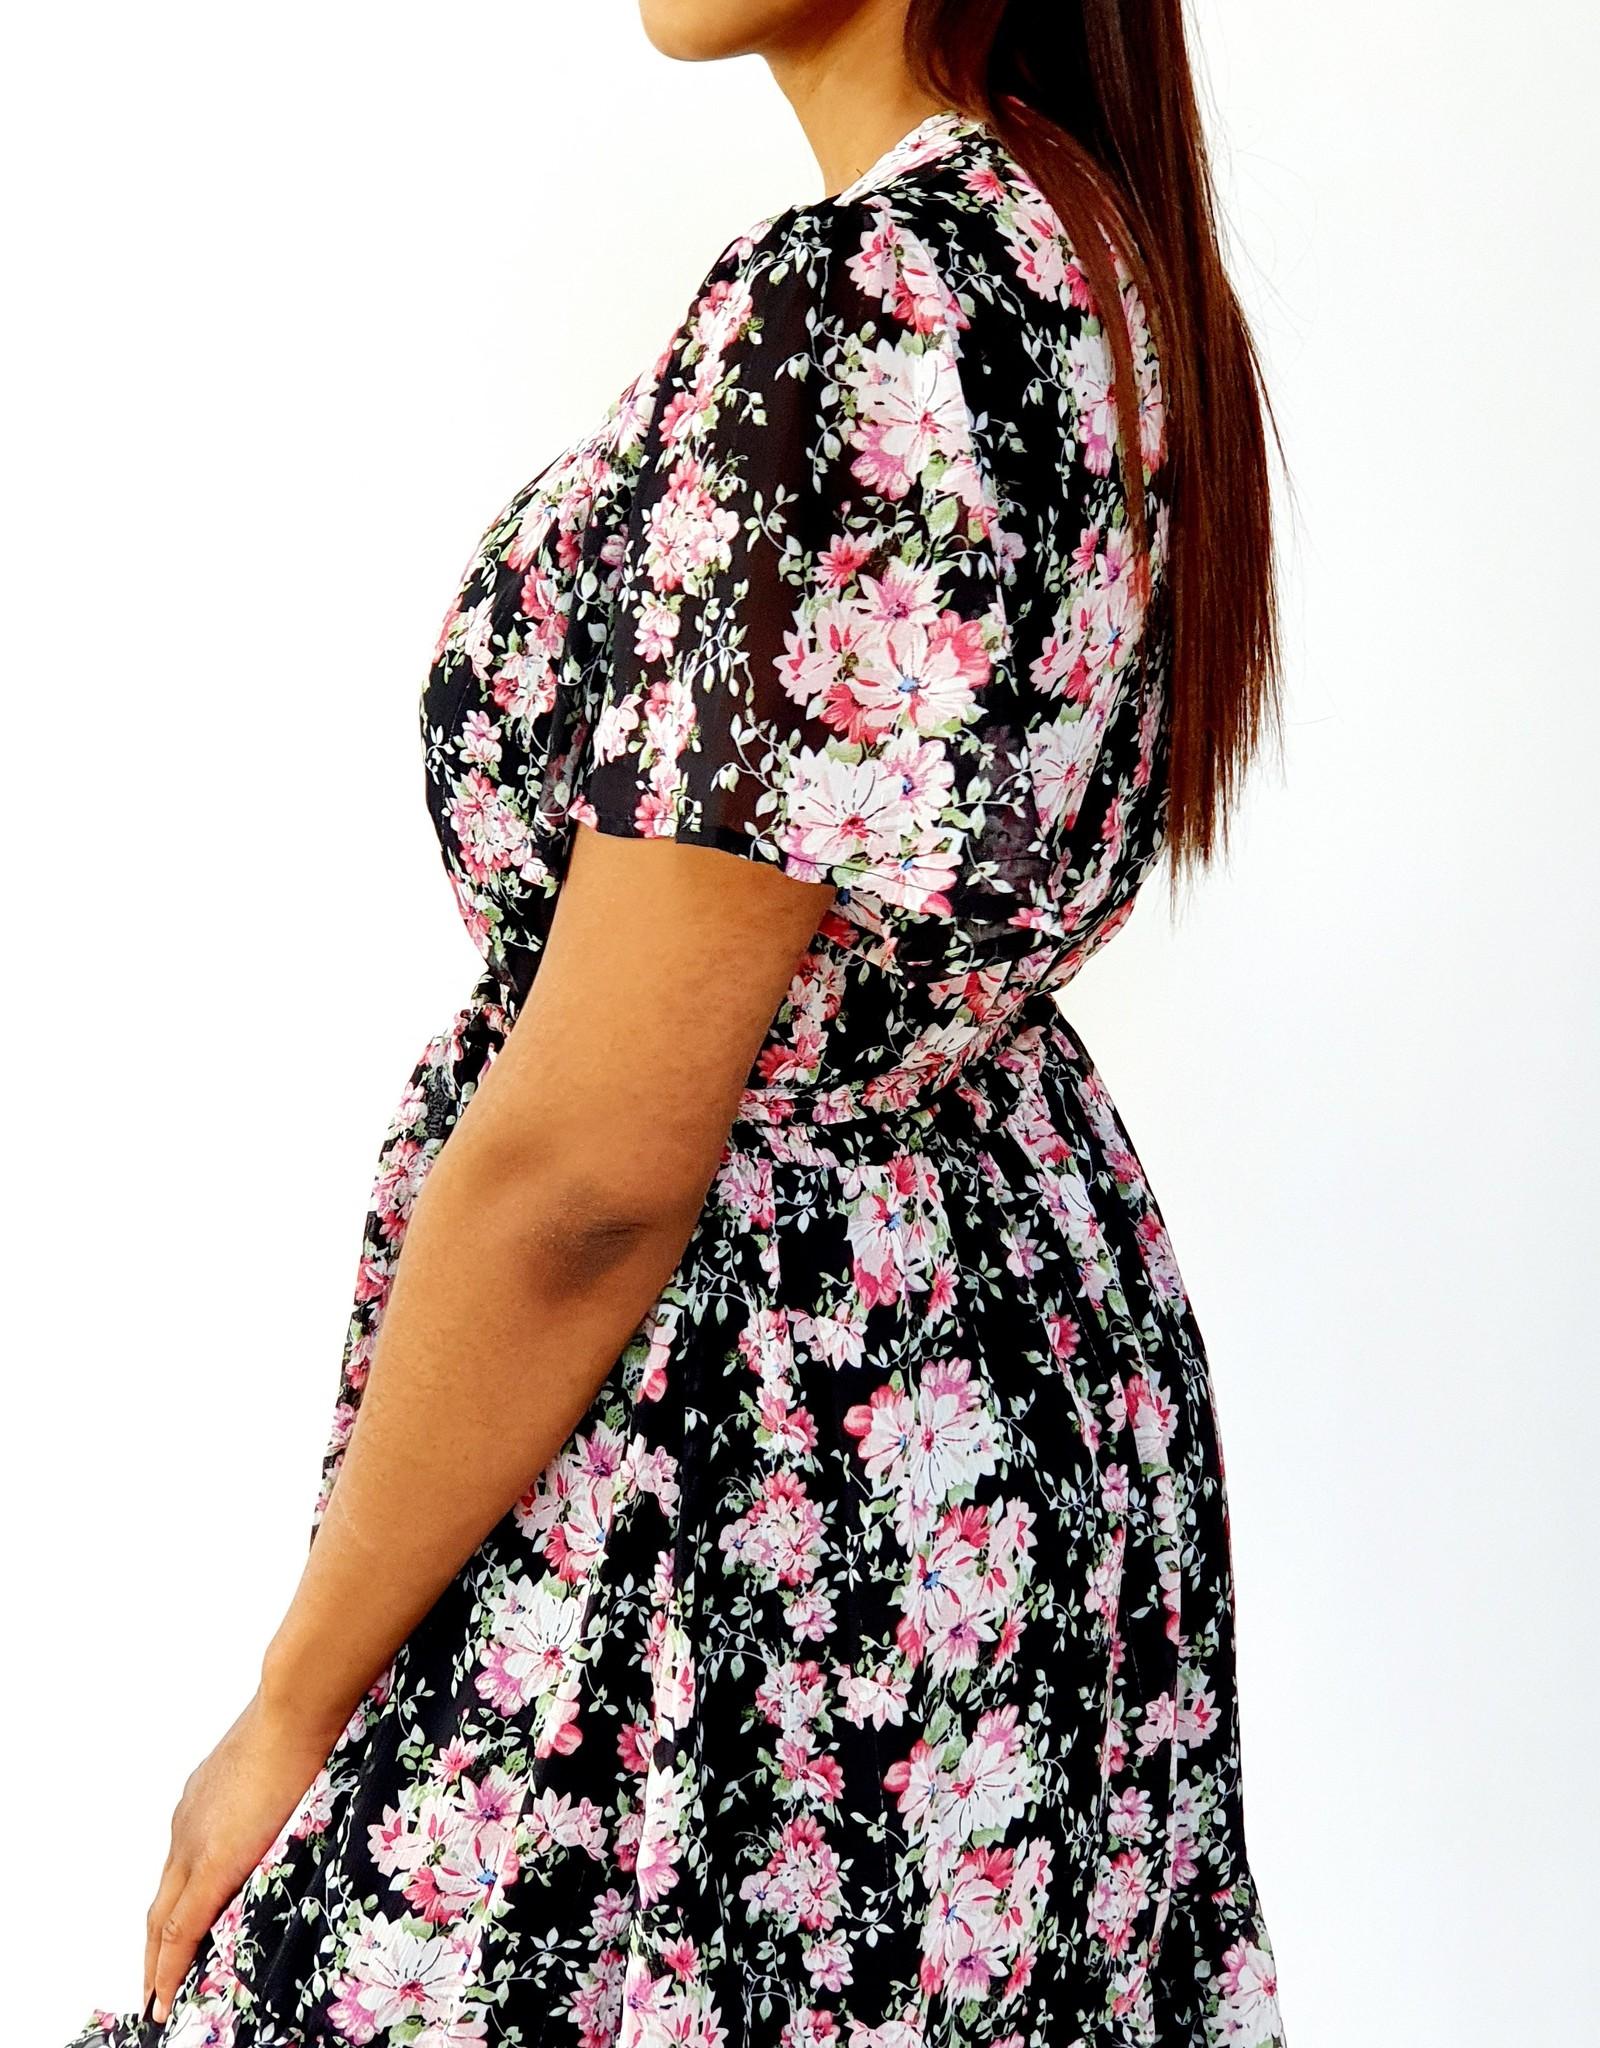 Thé sweet sweet black dress